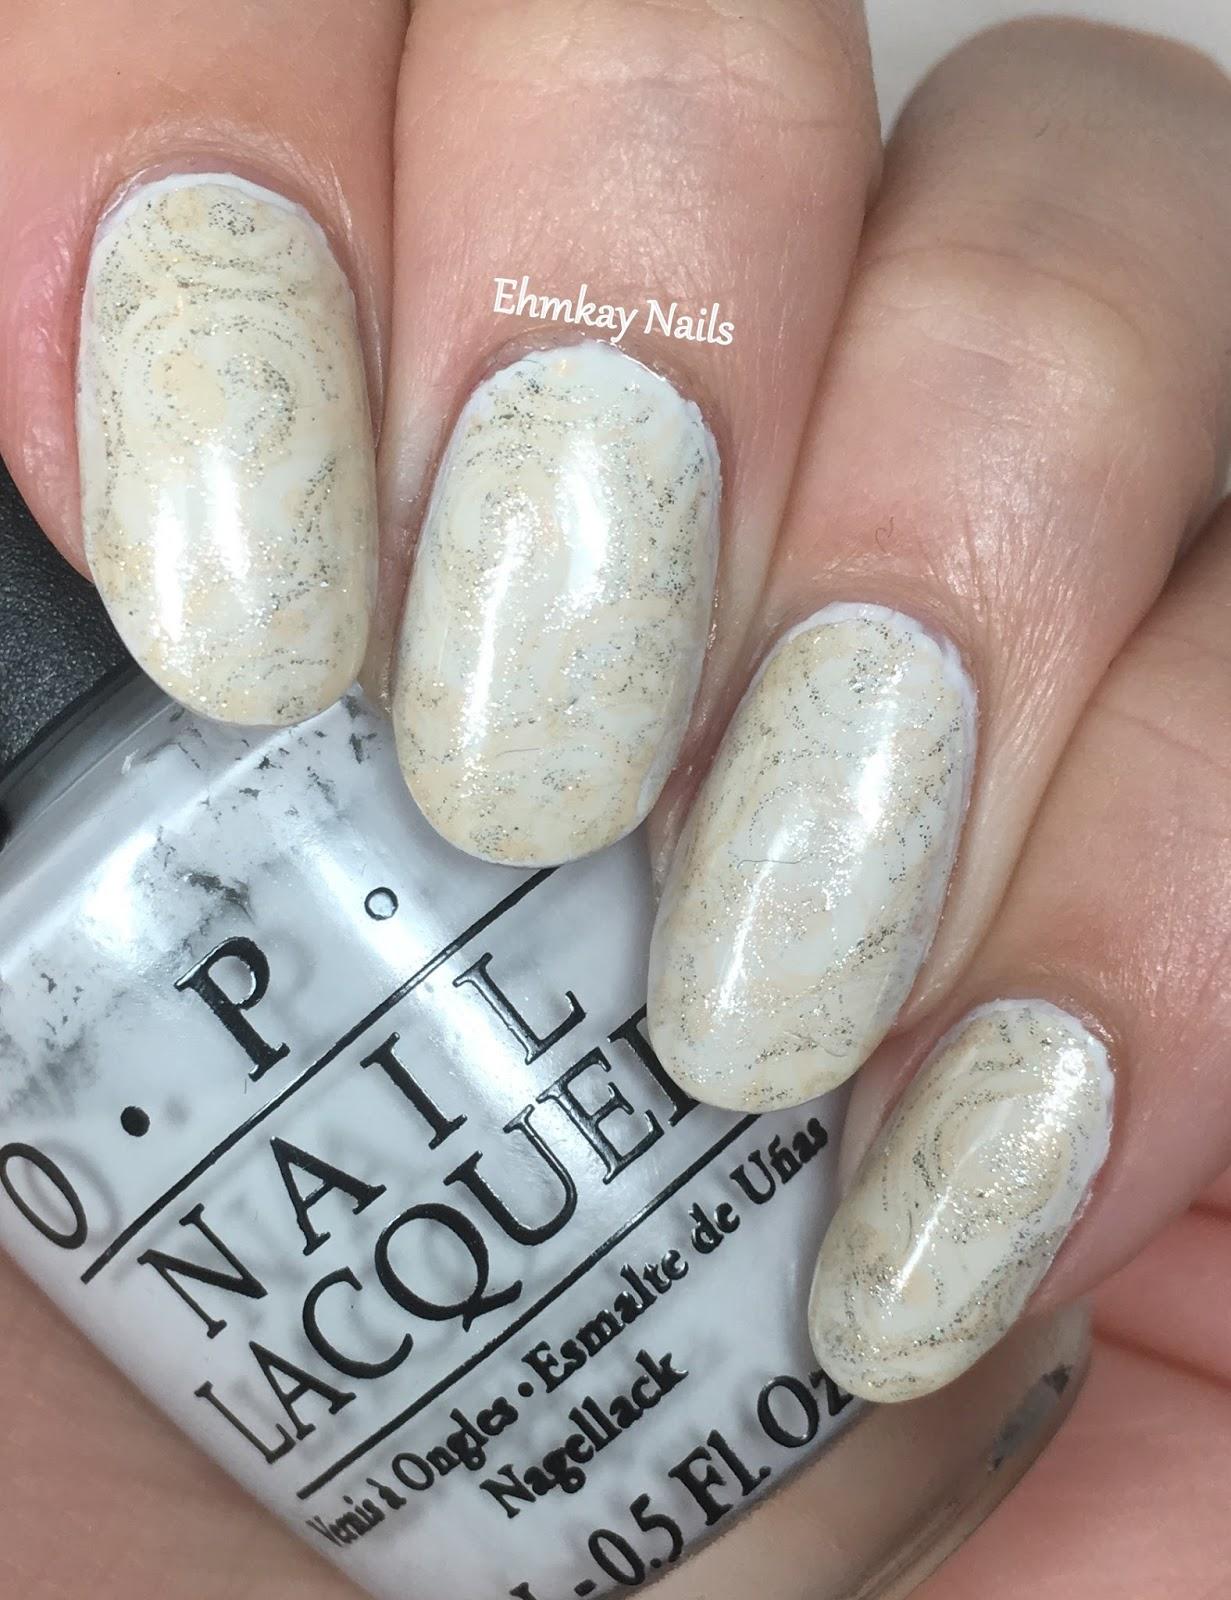 Ehmkay nails bone china nail art with opi bone china nail art with opi prinsesfo Images